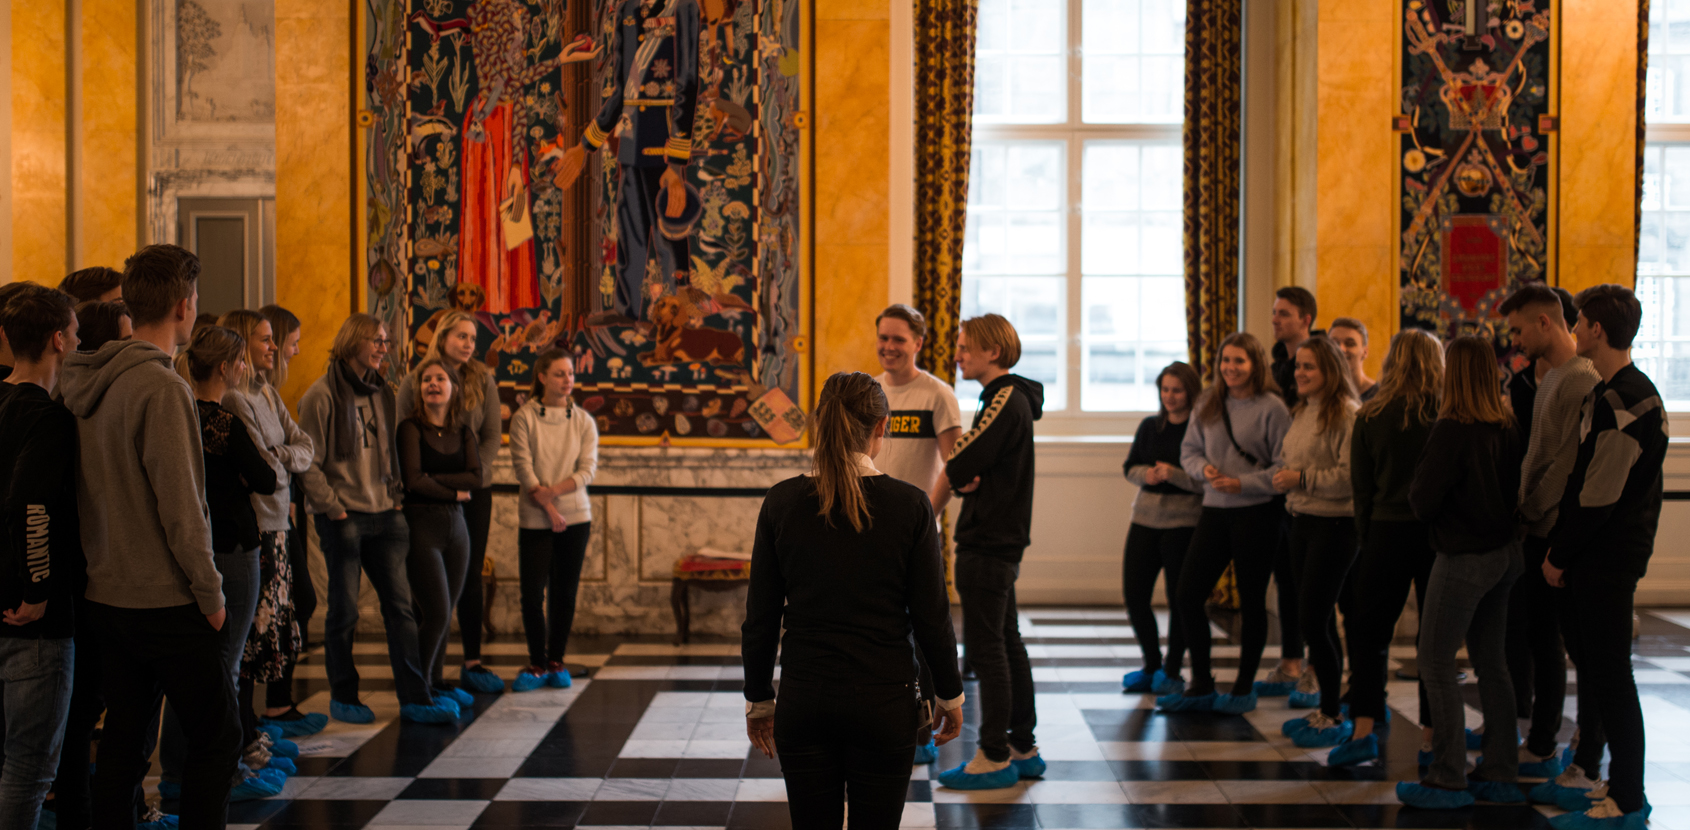 Undervisning i Riddersalen_Christiansborg Slot_Silas Staal.jpg